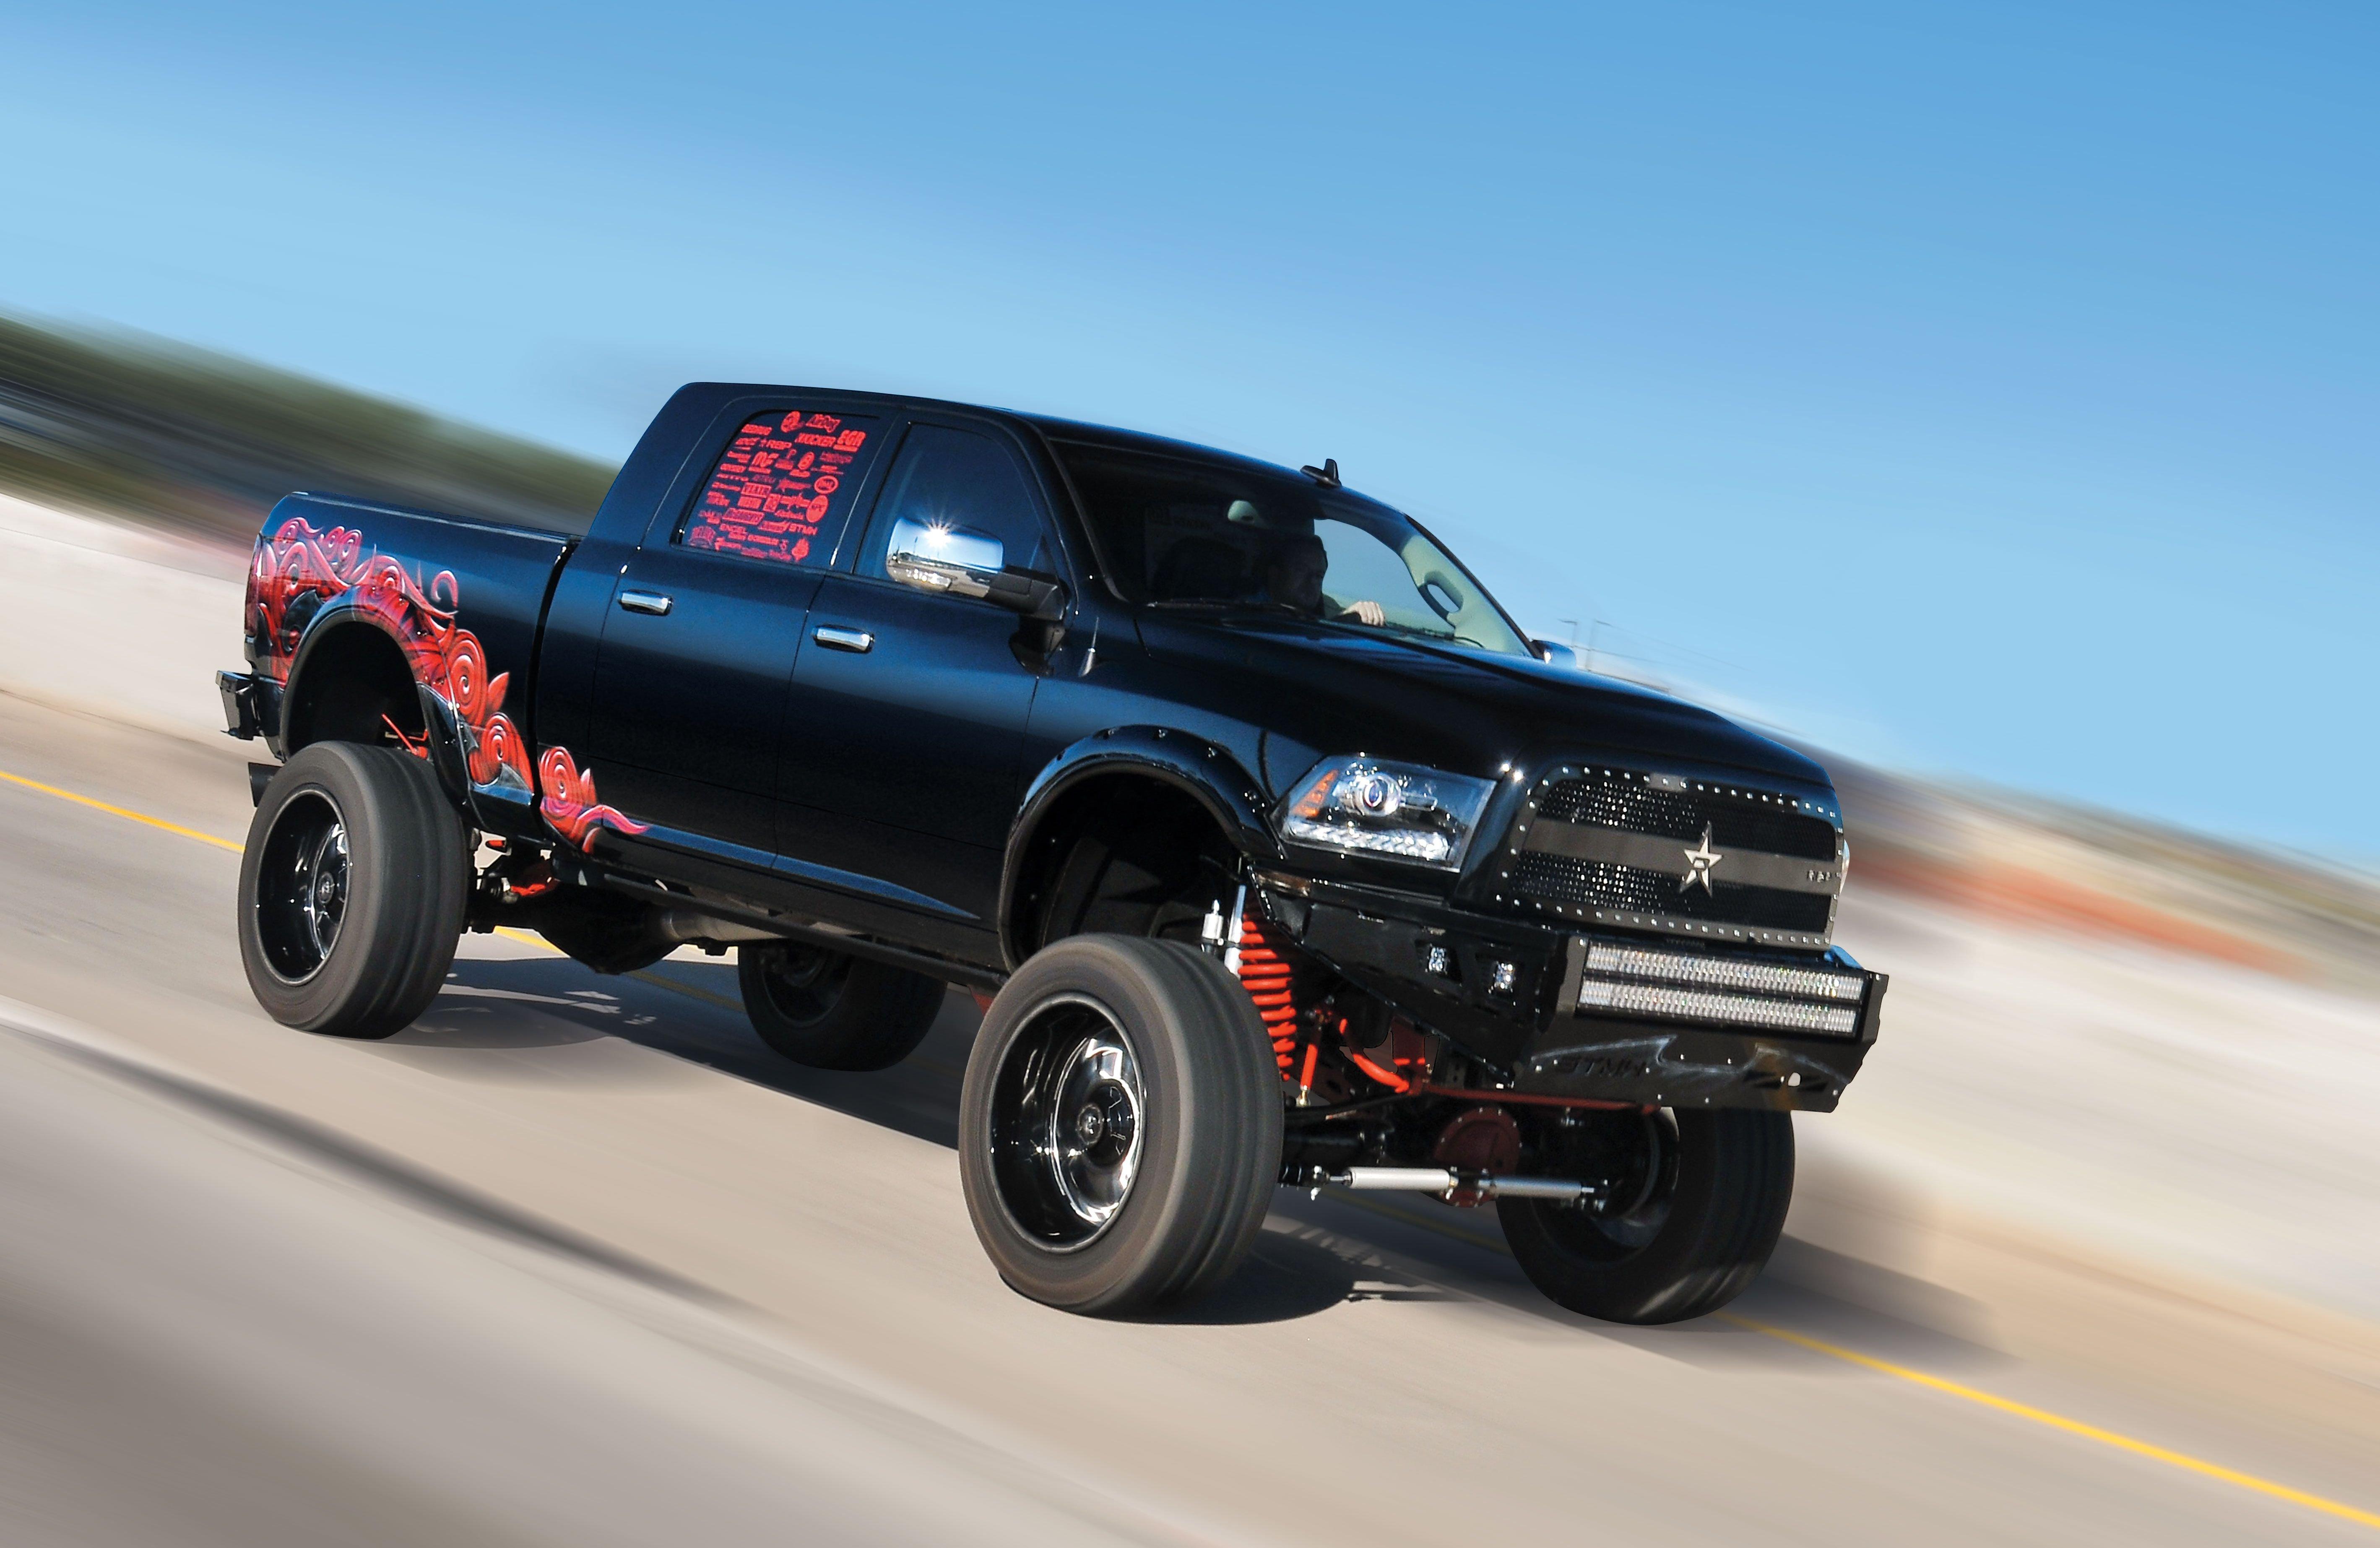 2014 dodge ram 2500 4x4 pickup custom mopar wallpaper 5675x3691 863012 wallpaperup - Dodge Truck 2015 Custom